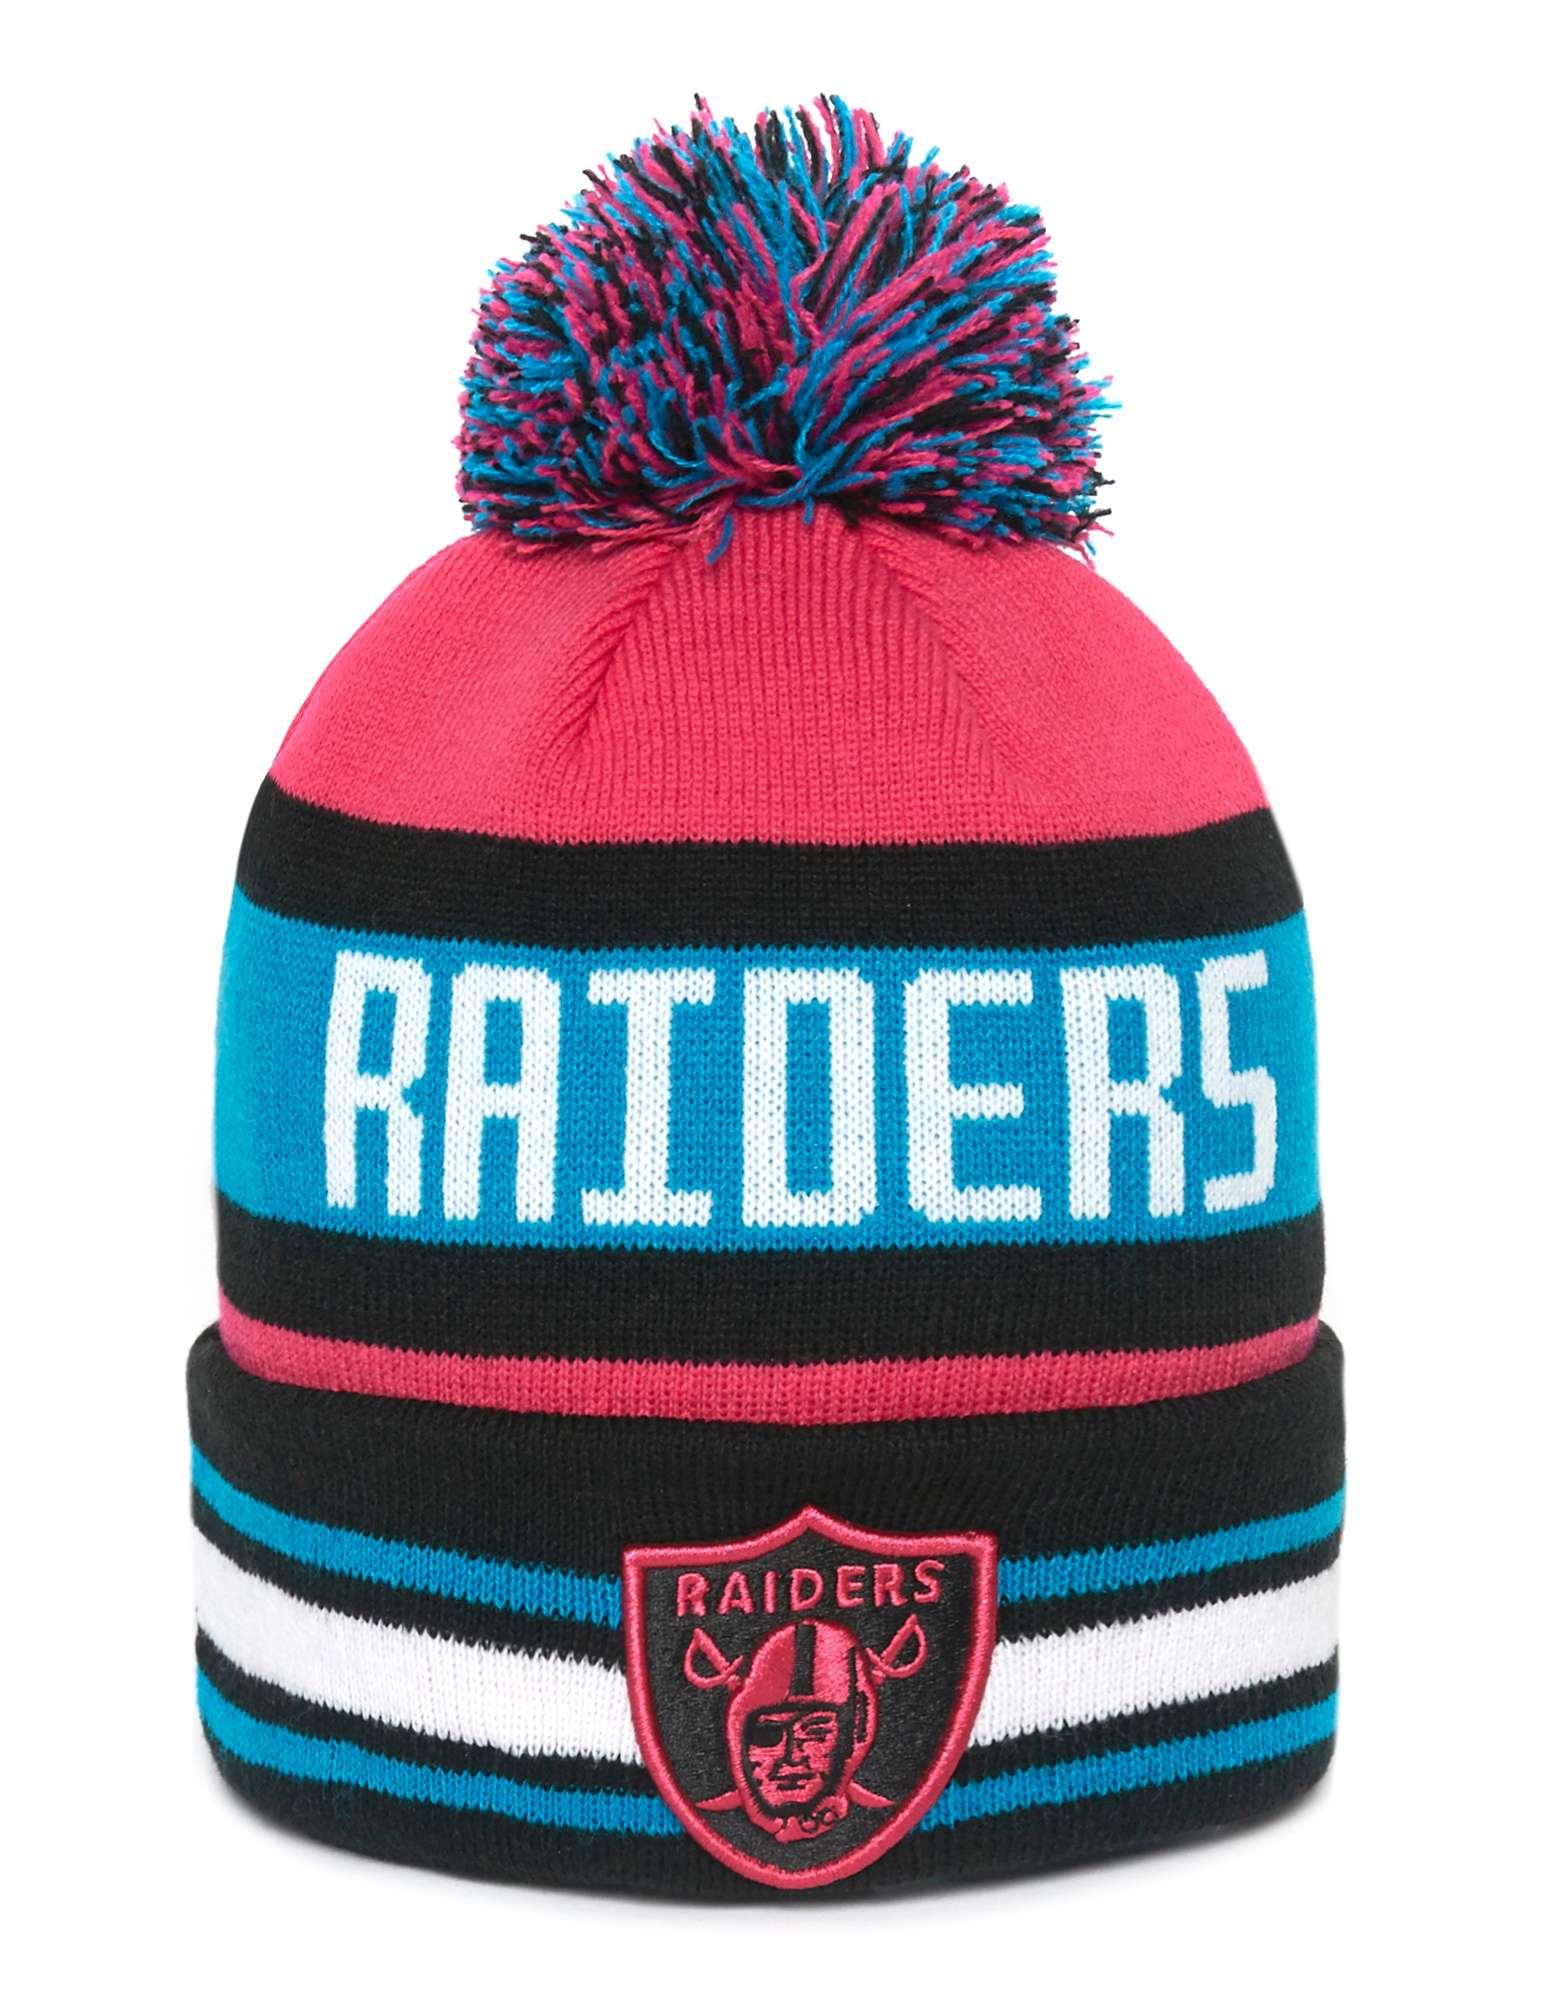 New Era NFL Oakland Raiders The Jake Knitted Hat